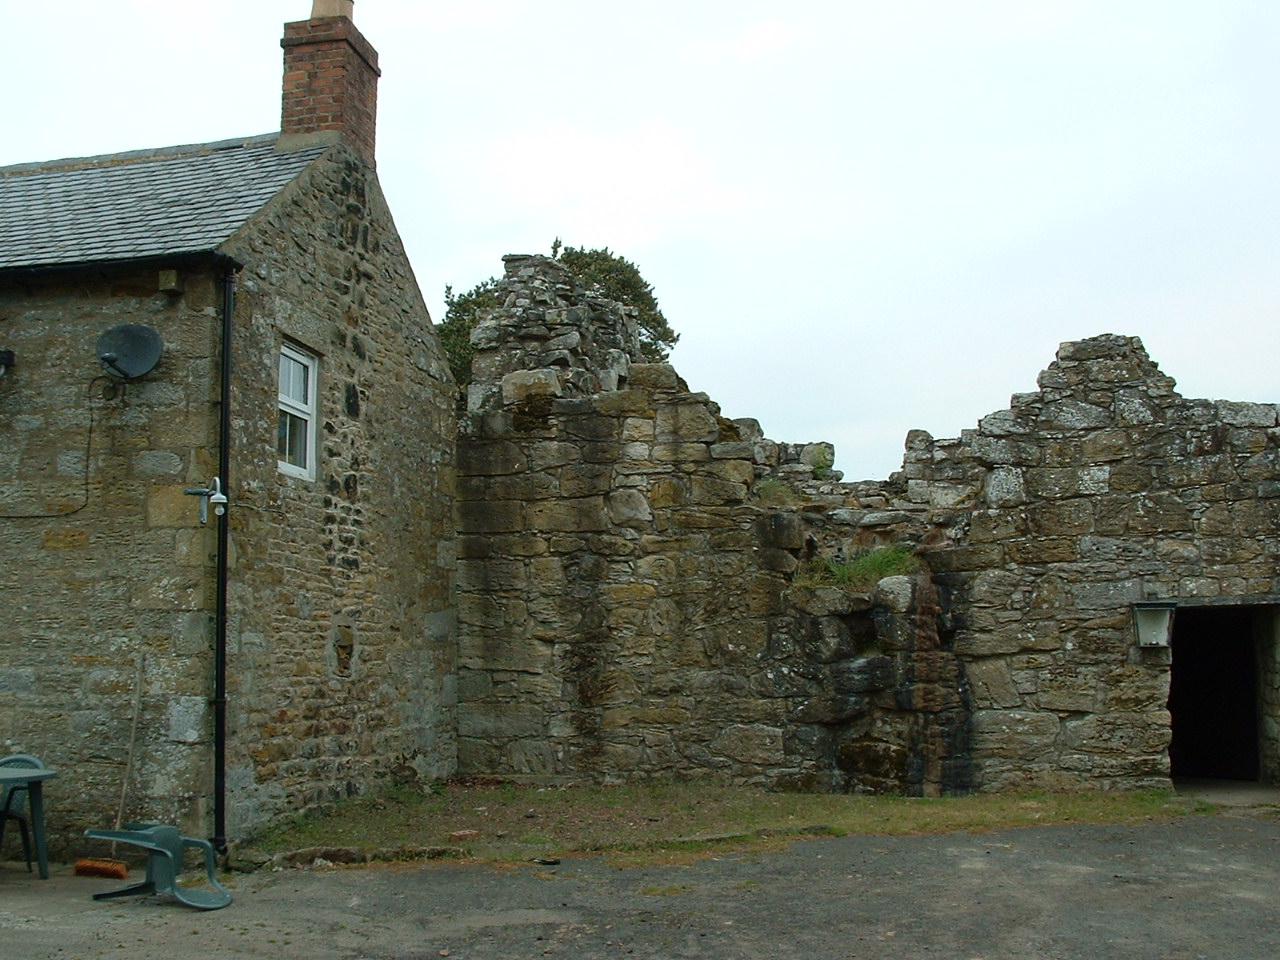 Northumberland Image Gallery 1